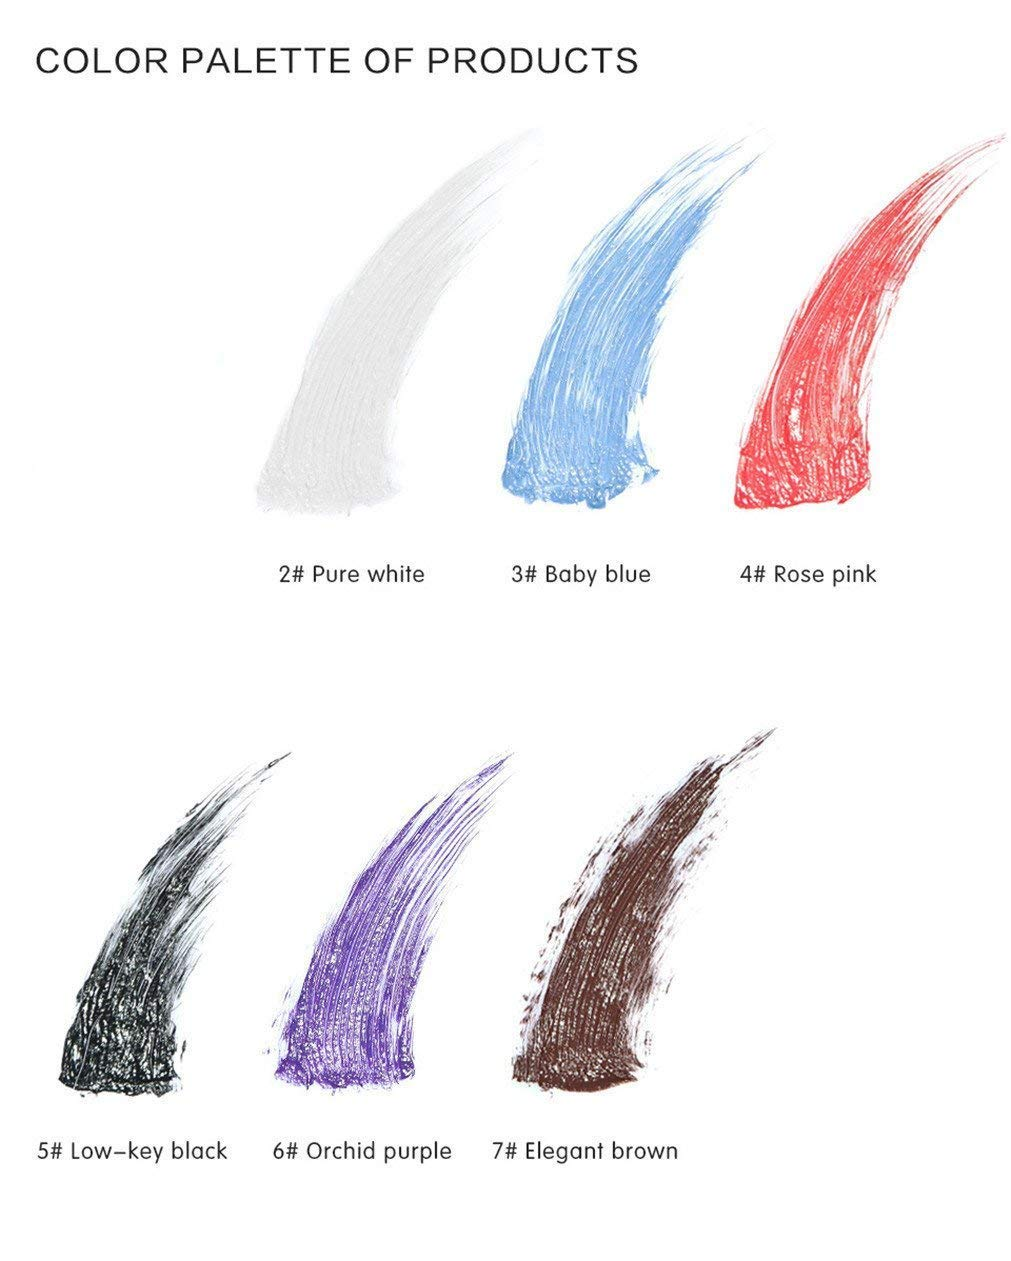 FantasyDay 6Pcs Colors Rainbow Colorful Mascara Waterproof Color Mascara Colorful Eyelash Makeup 3D Fiber Lash Mascara Volume Eye lash Lengthening Gel Perfect Gift for Girls Kids Women by FantasyDay (Image #8)